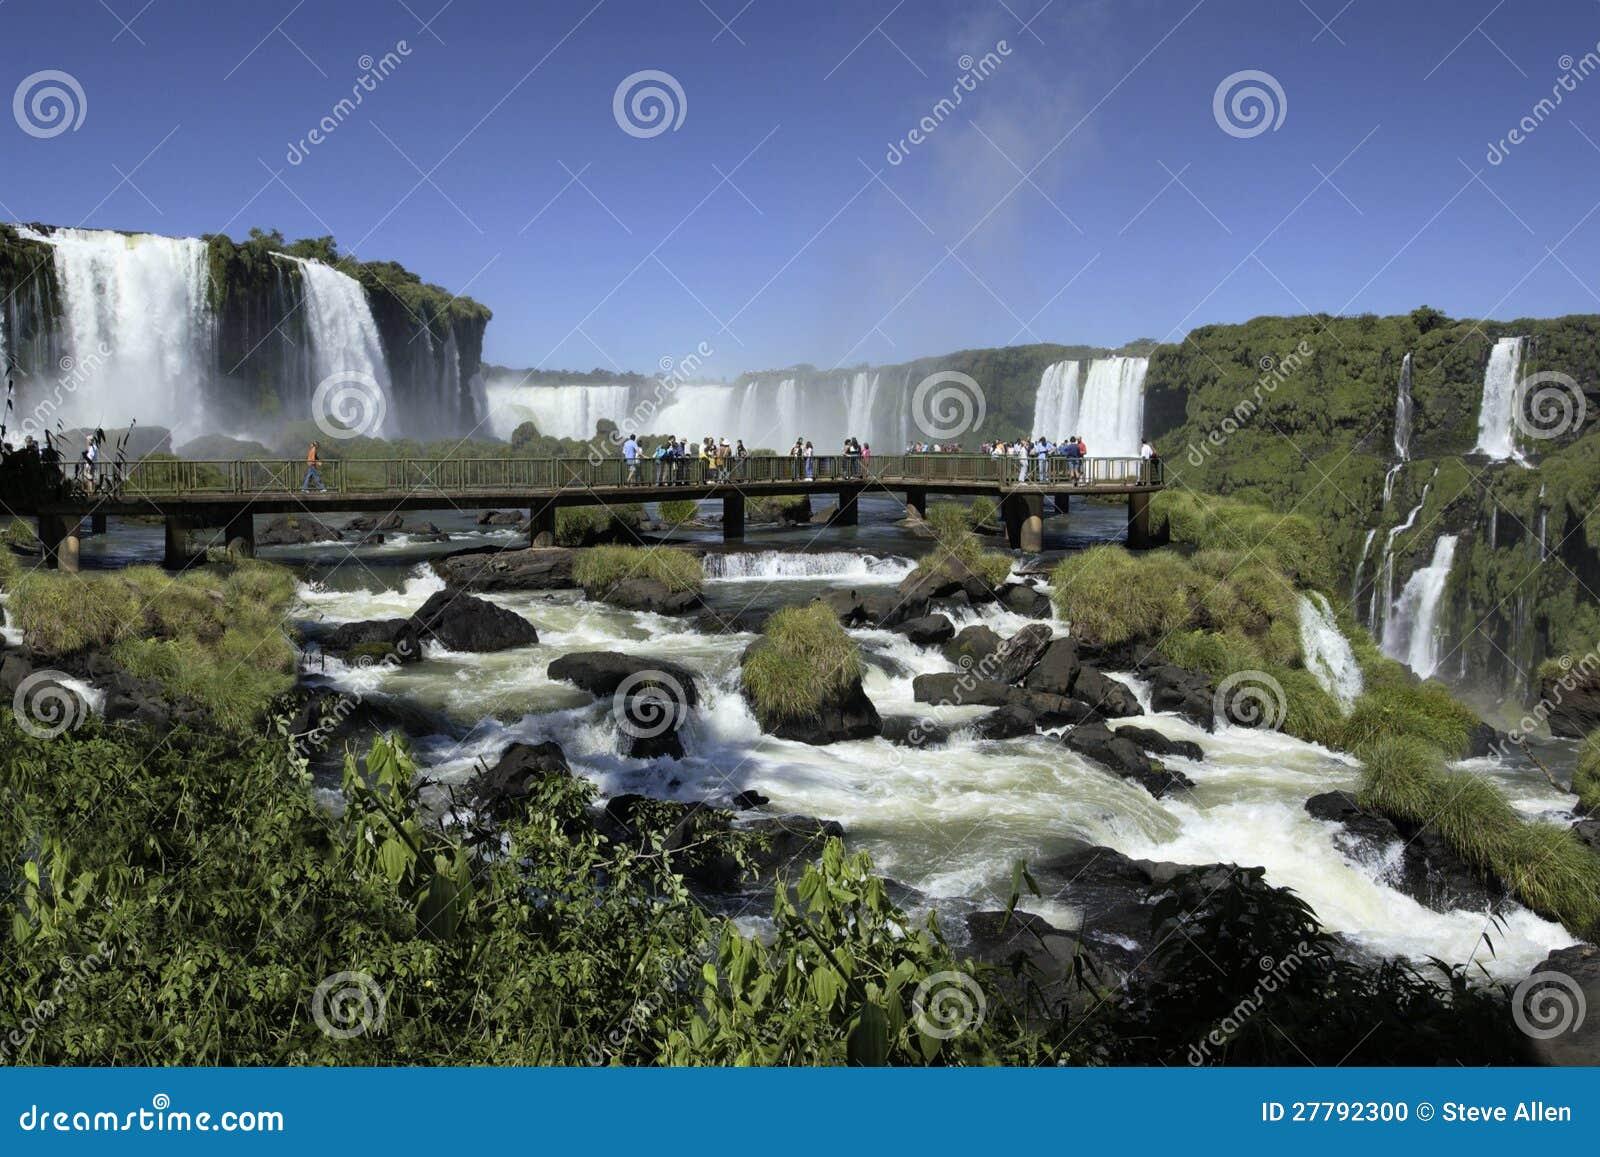 Iguassu Falls on the Brazil Argentina border